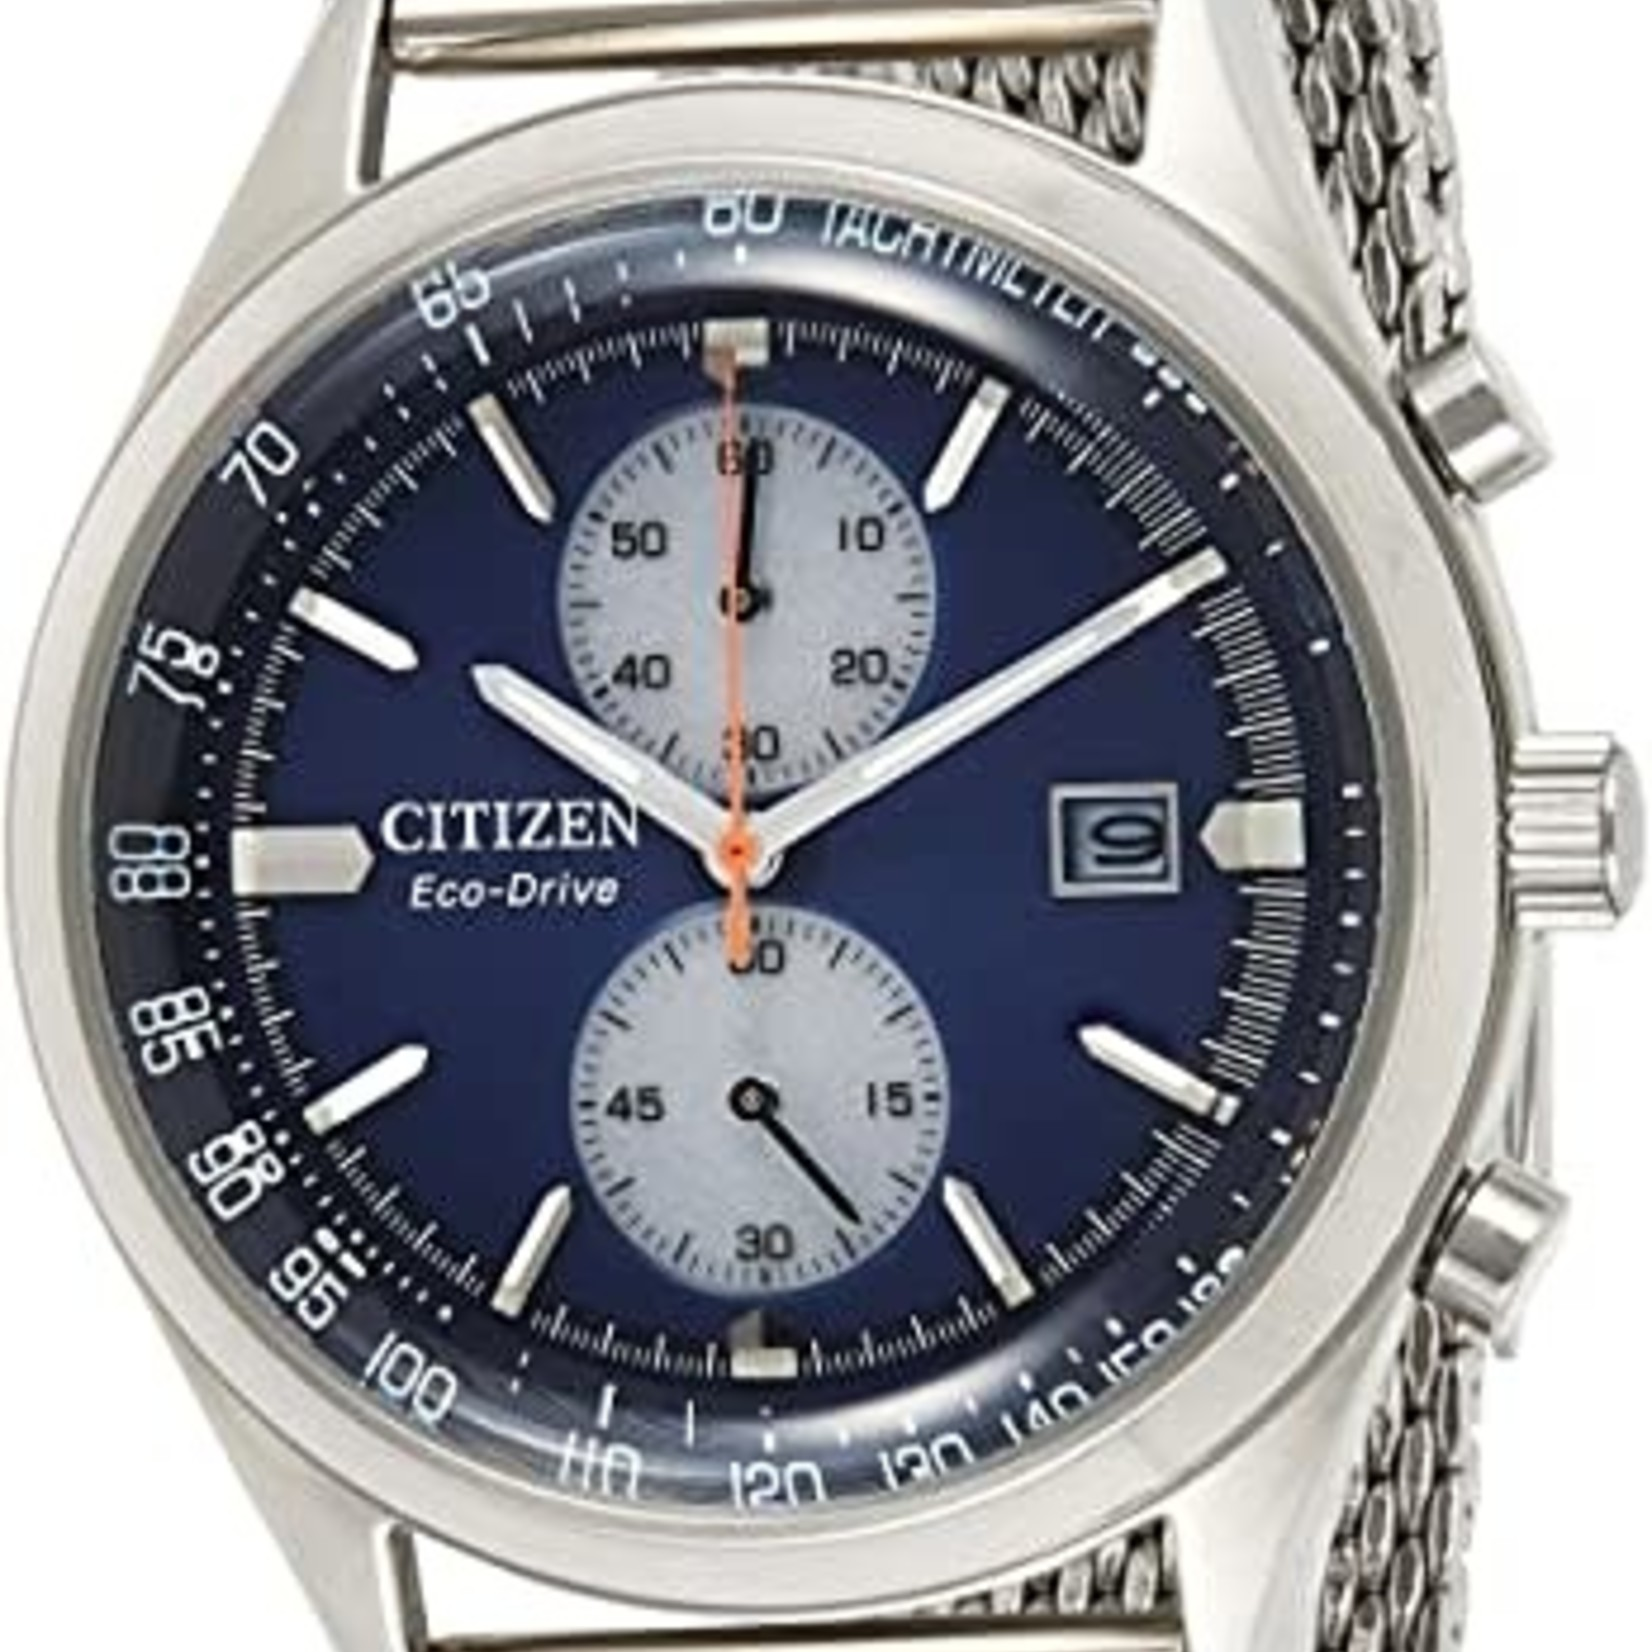 Citizen Men's CA7020-58L Chronograph Eco-Drive Watch *Grade A